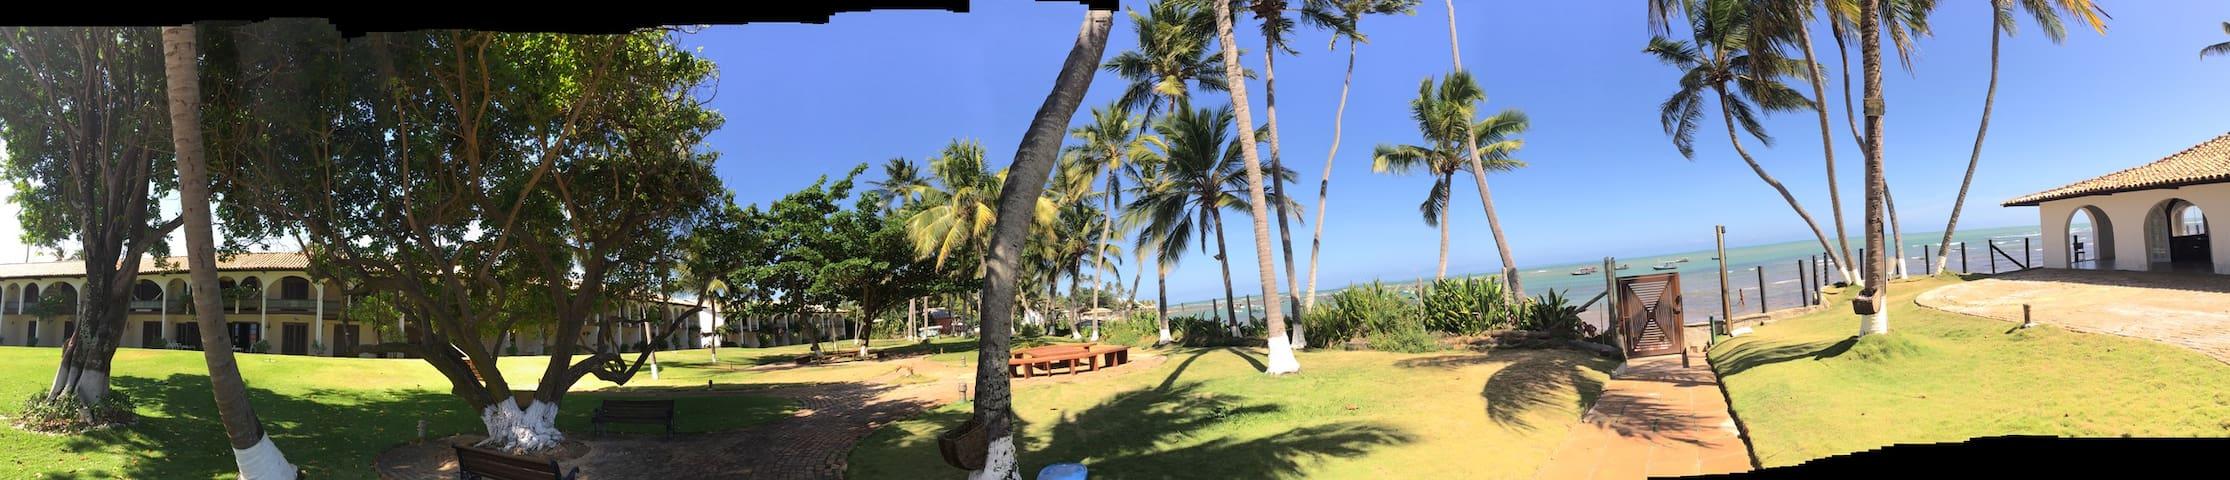 BAHIA PARADISE - PRAIA DO FORTE - Praia do Forte - Casa